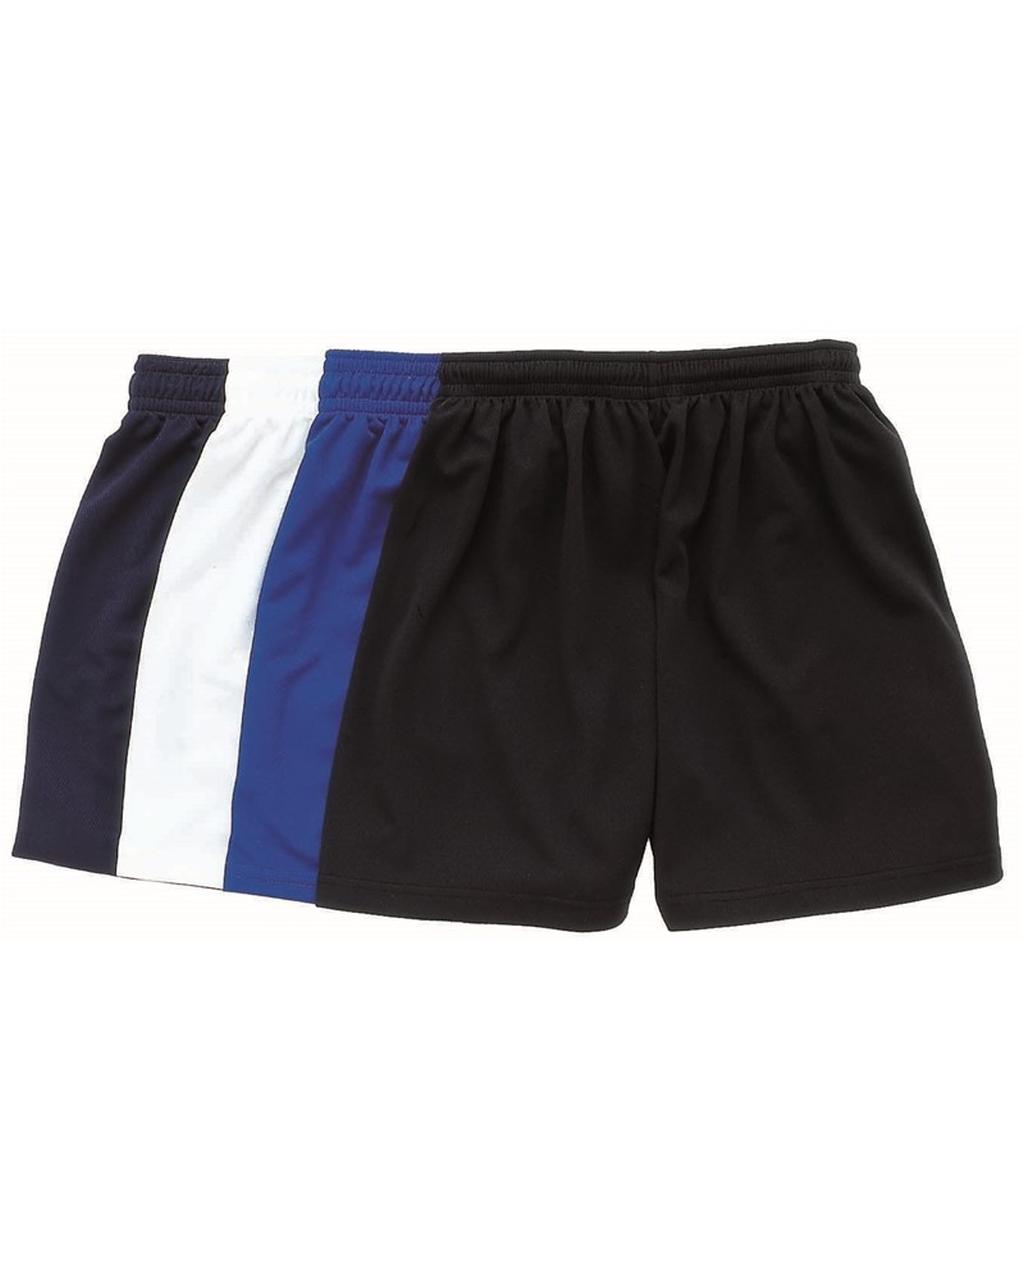 Football Shorts - 26/28